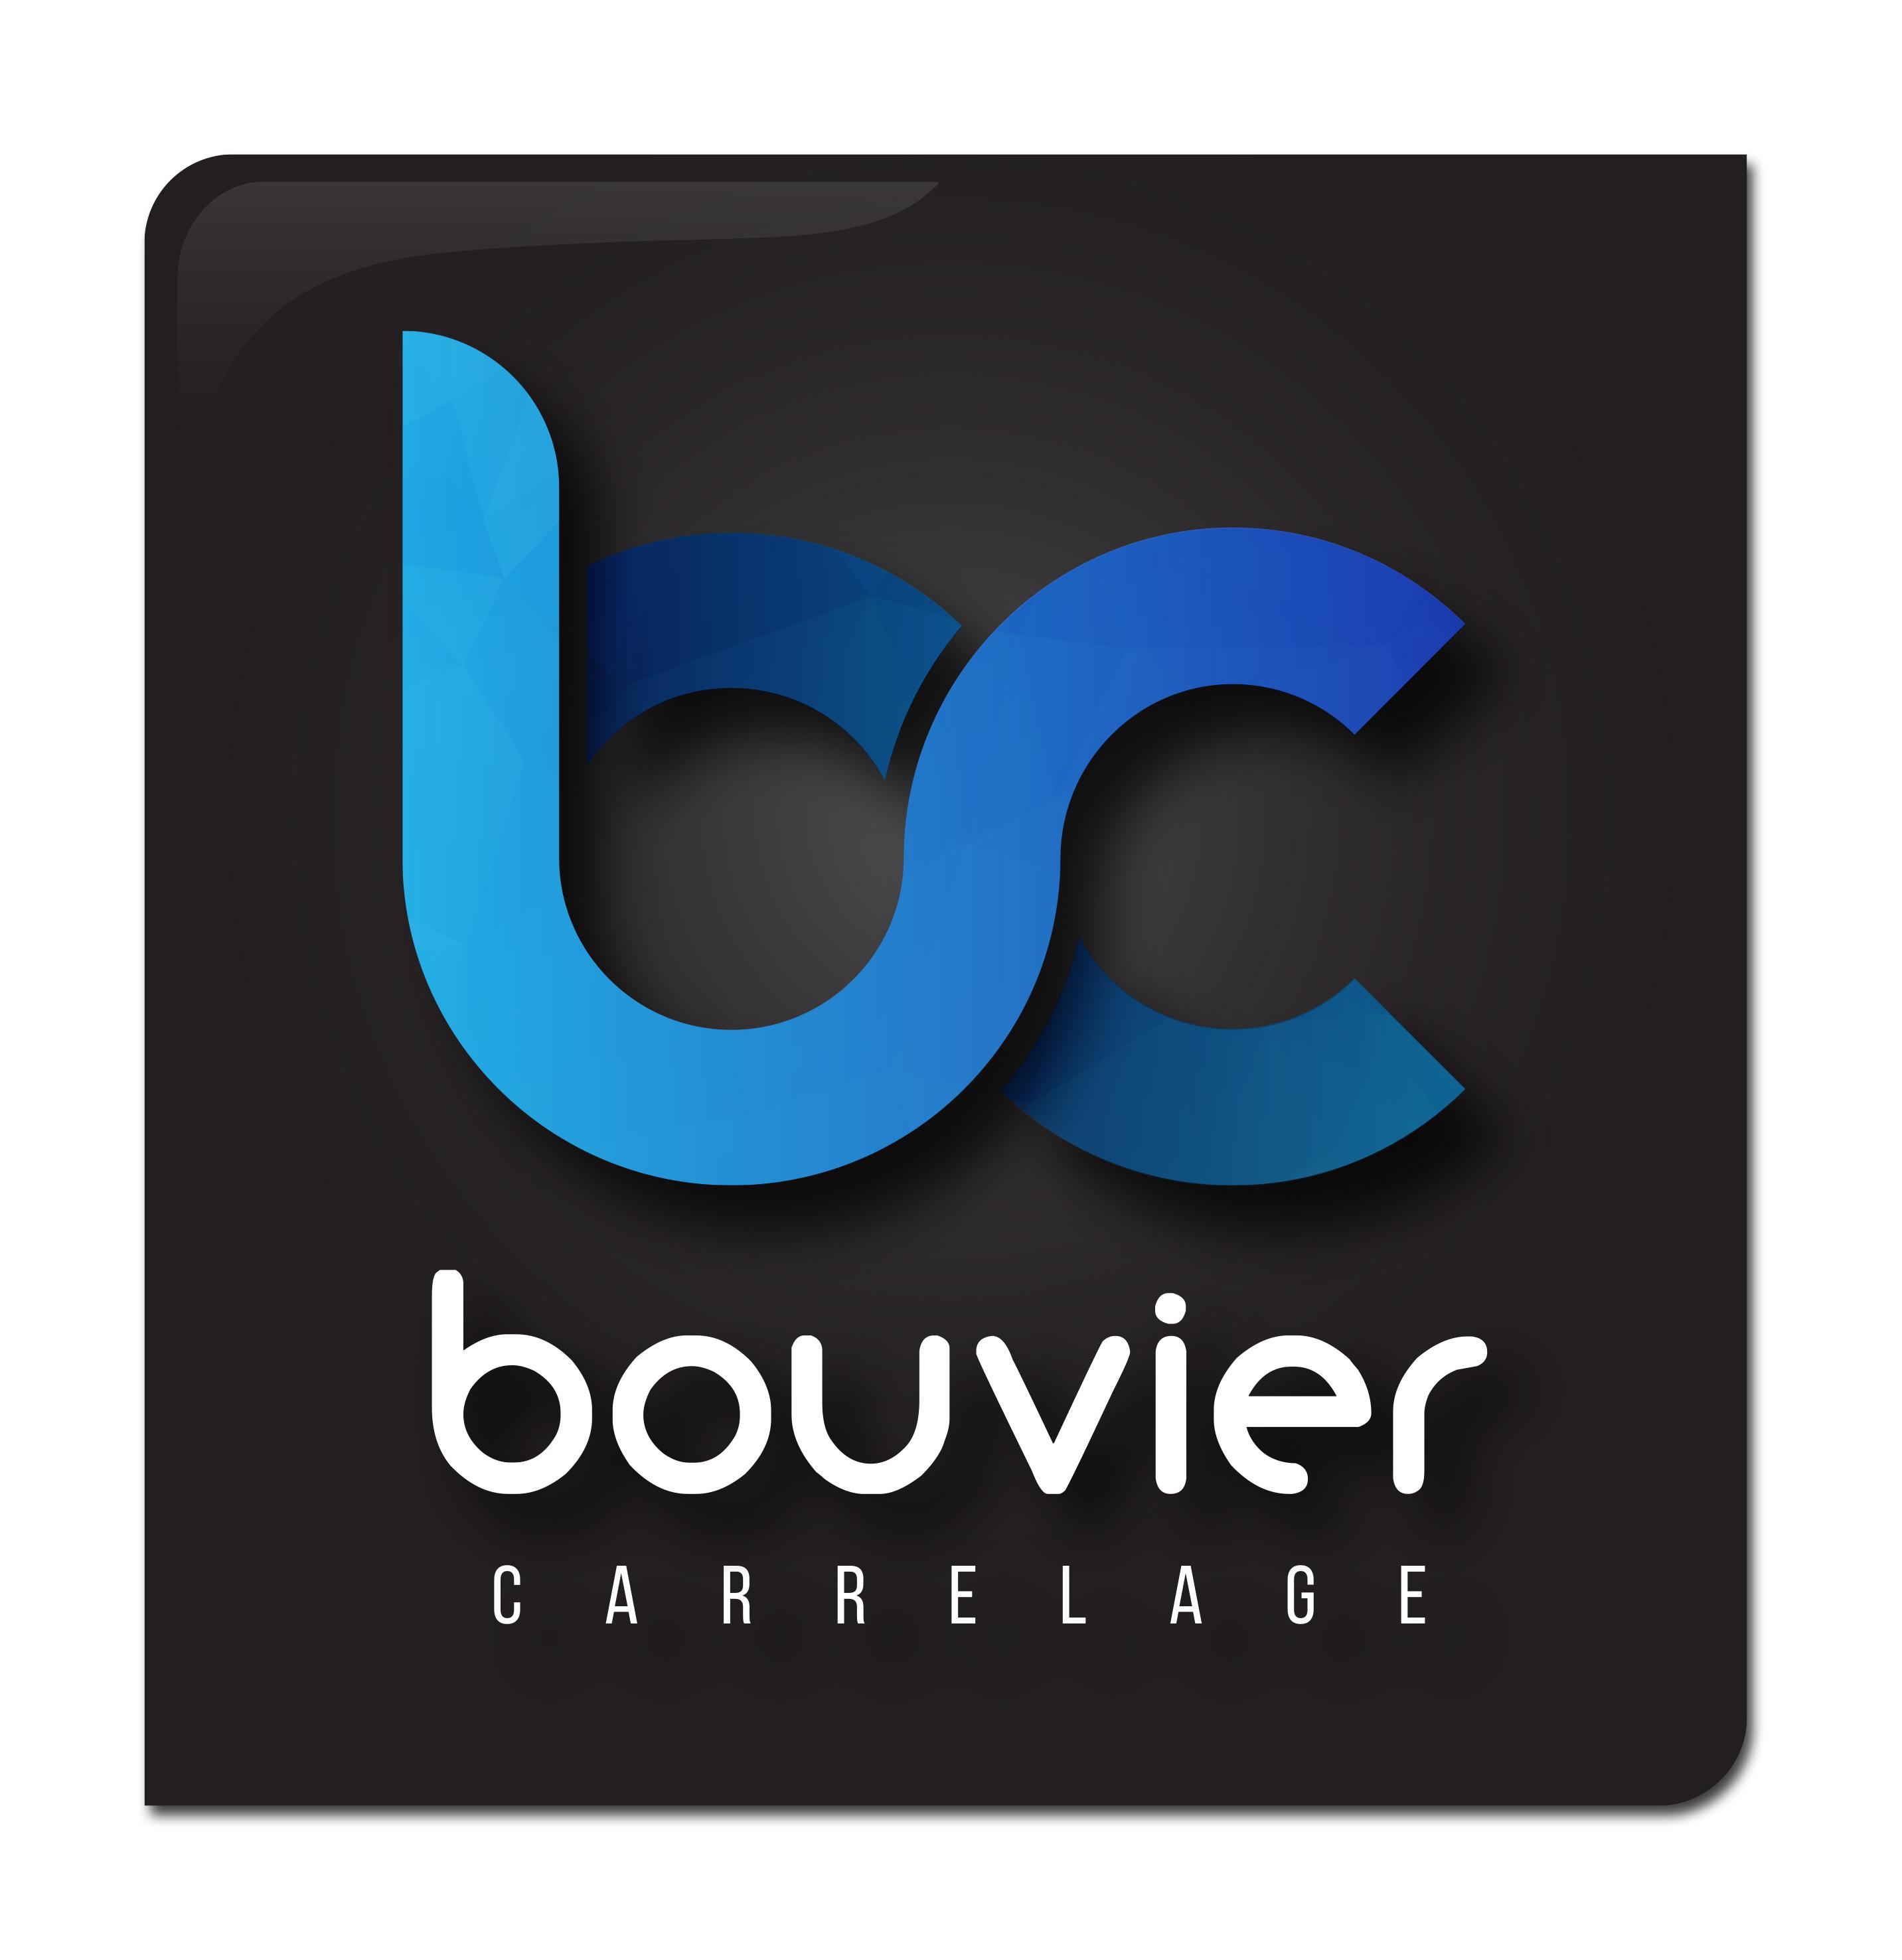 logo-bouvier-carrelage-magnetik-communic